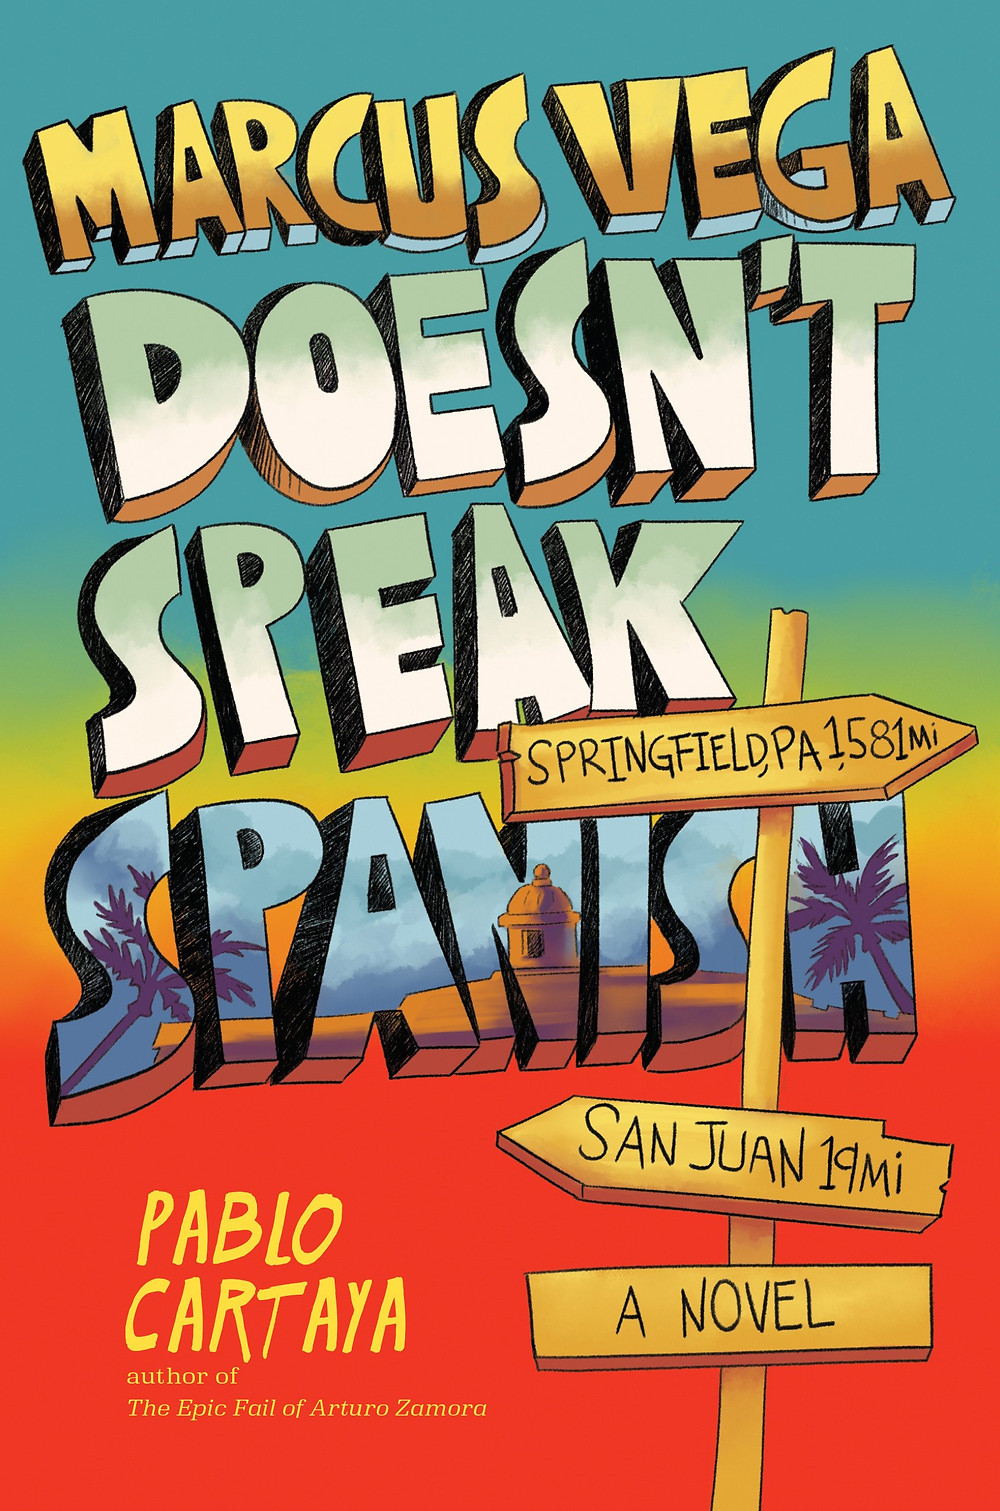 Marcus Vega Doesn't Speak Spanish by Pablo Cartaya